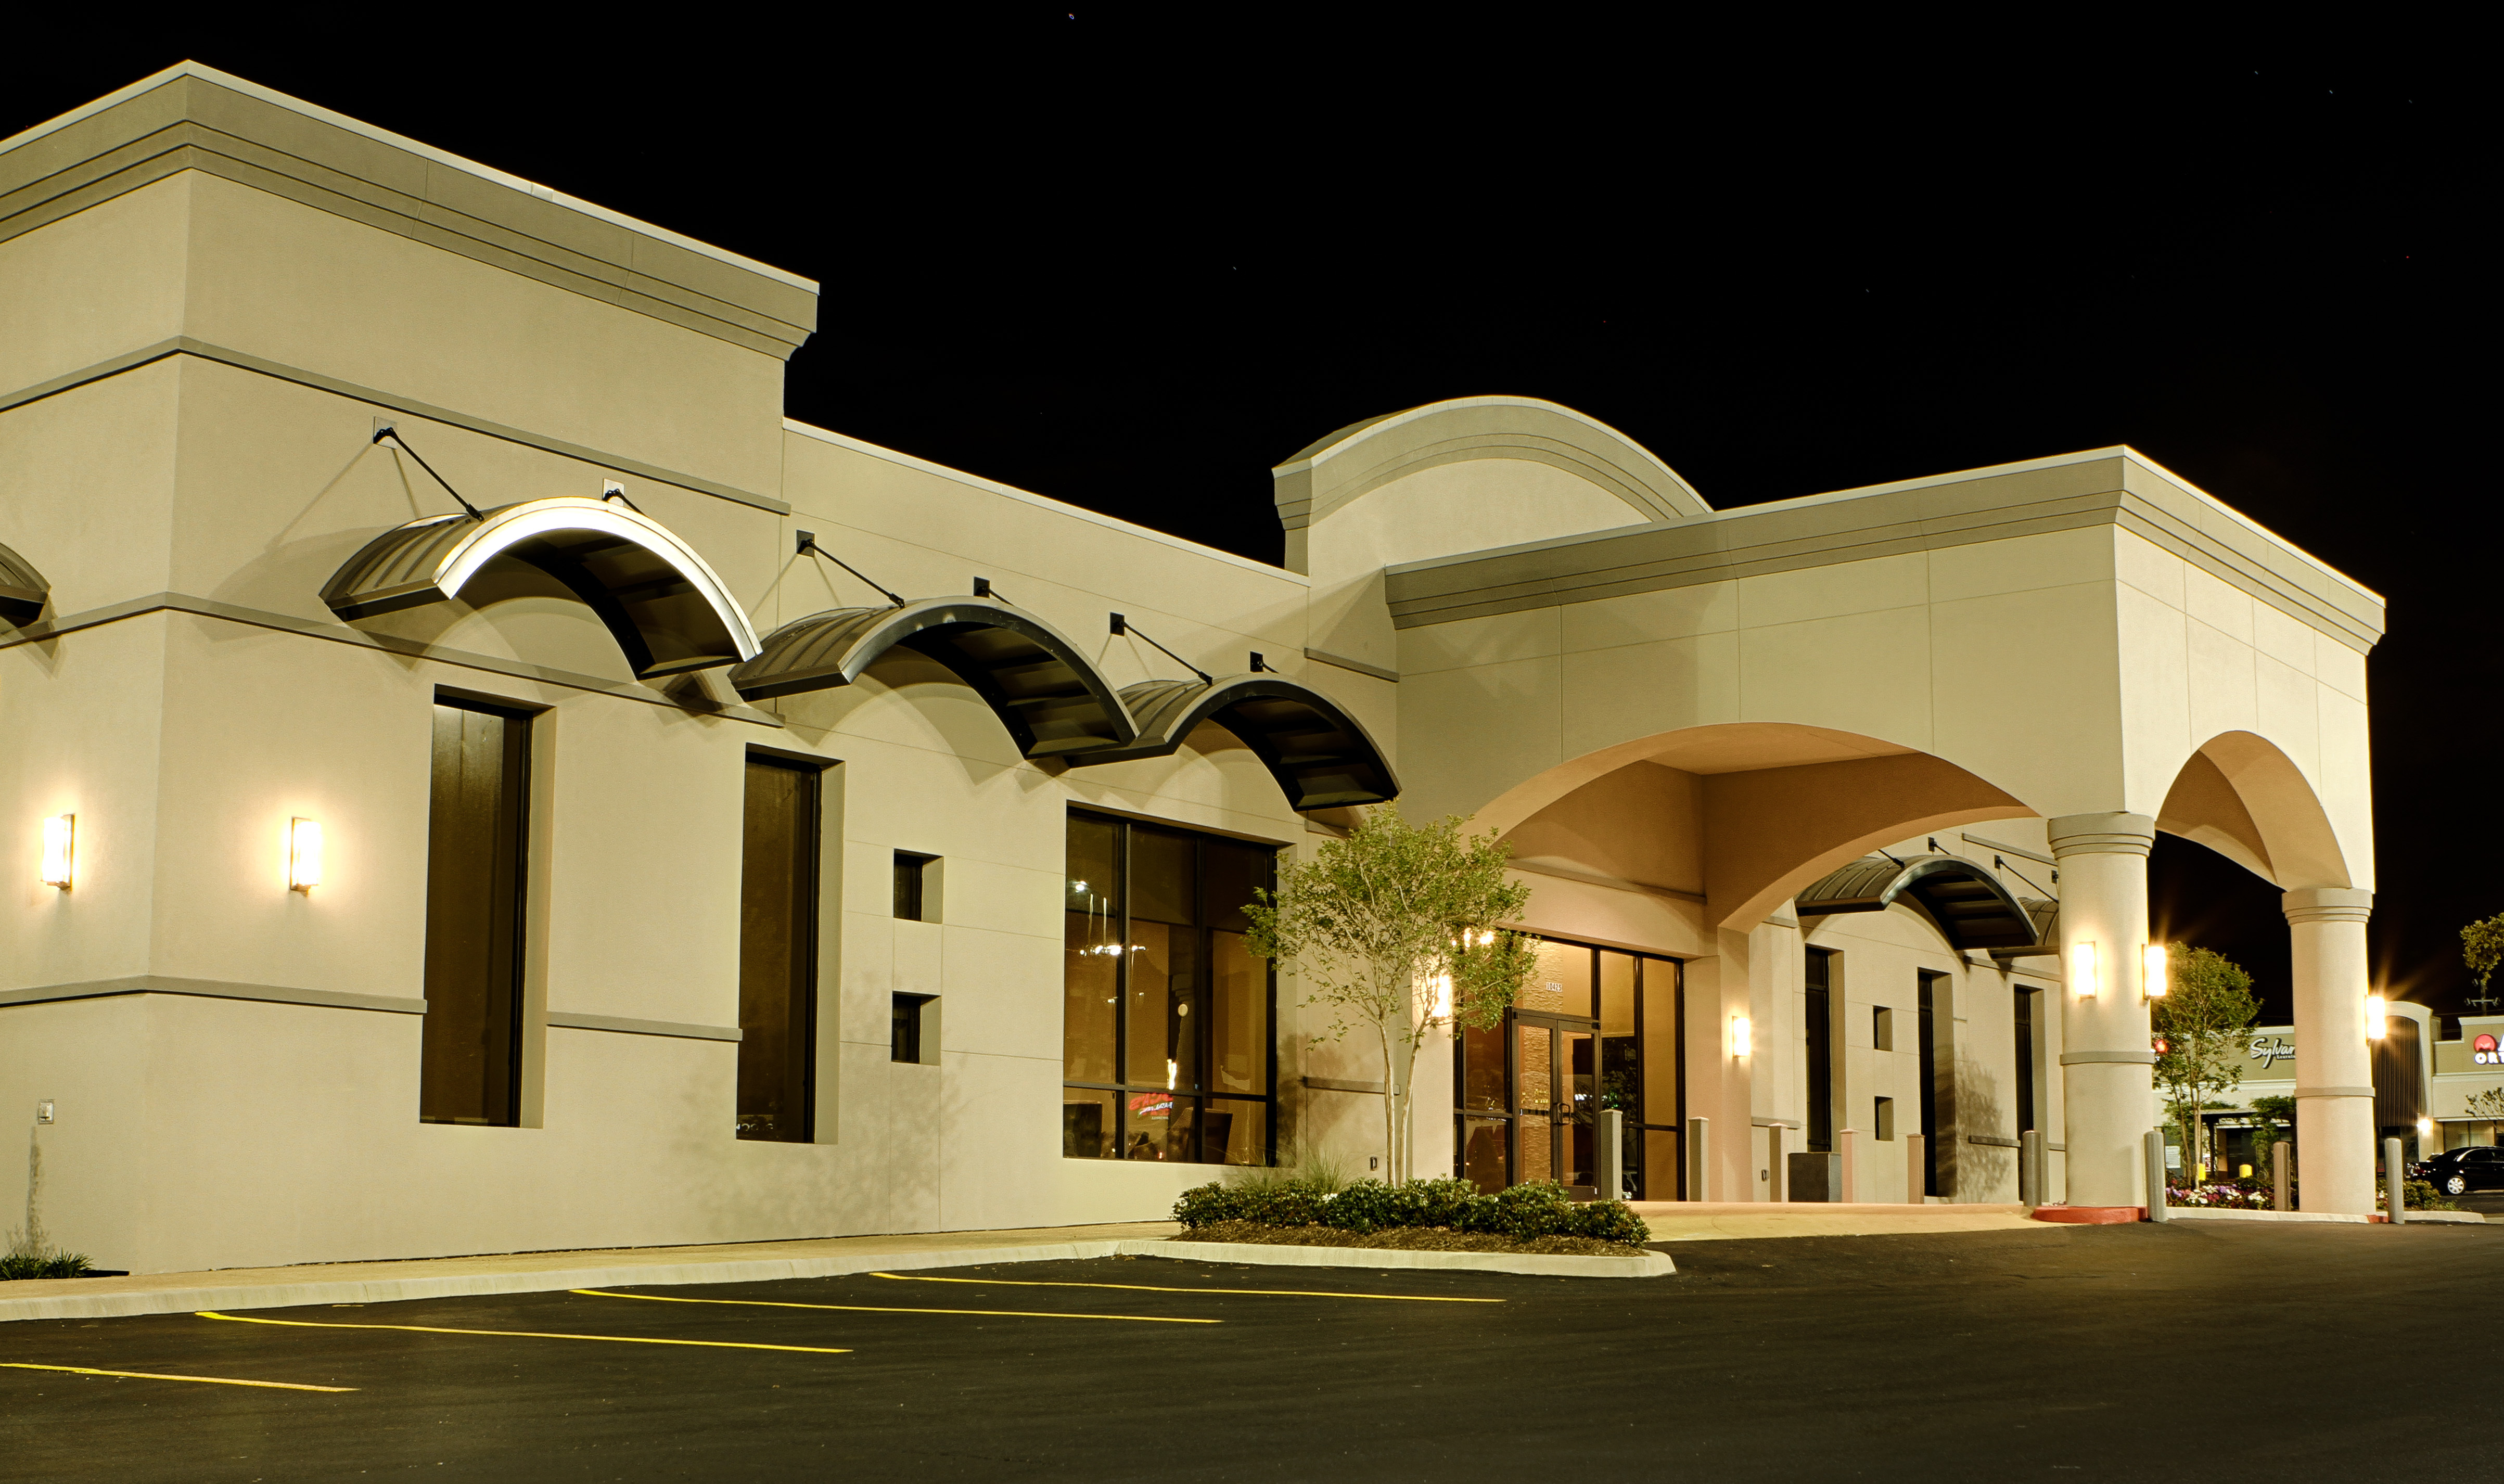 Premier Cancer Treatment Center - Dallas, TX (Photo: Business Wire)